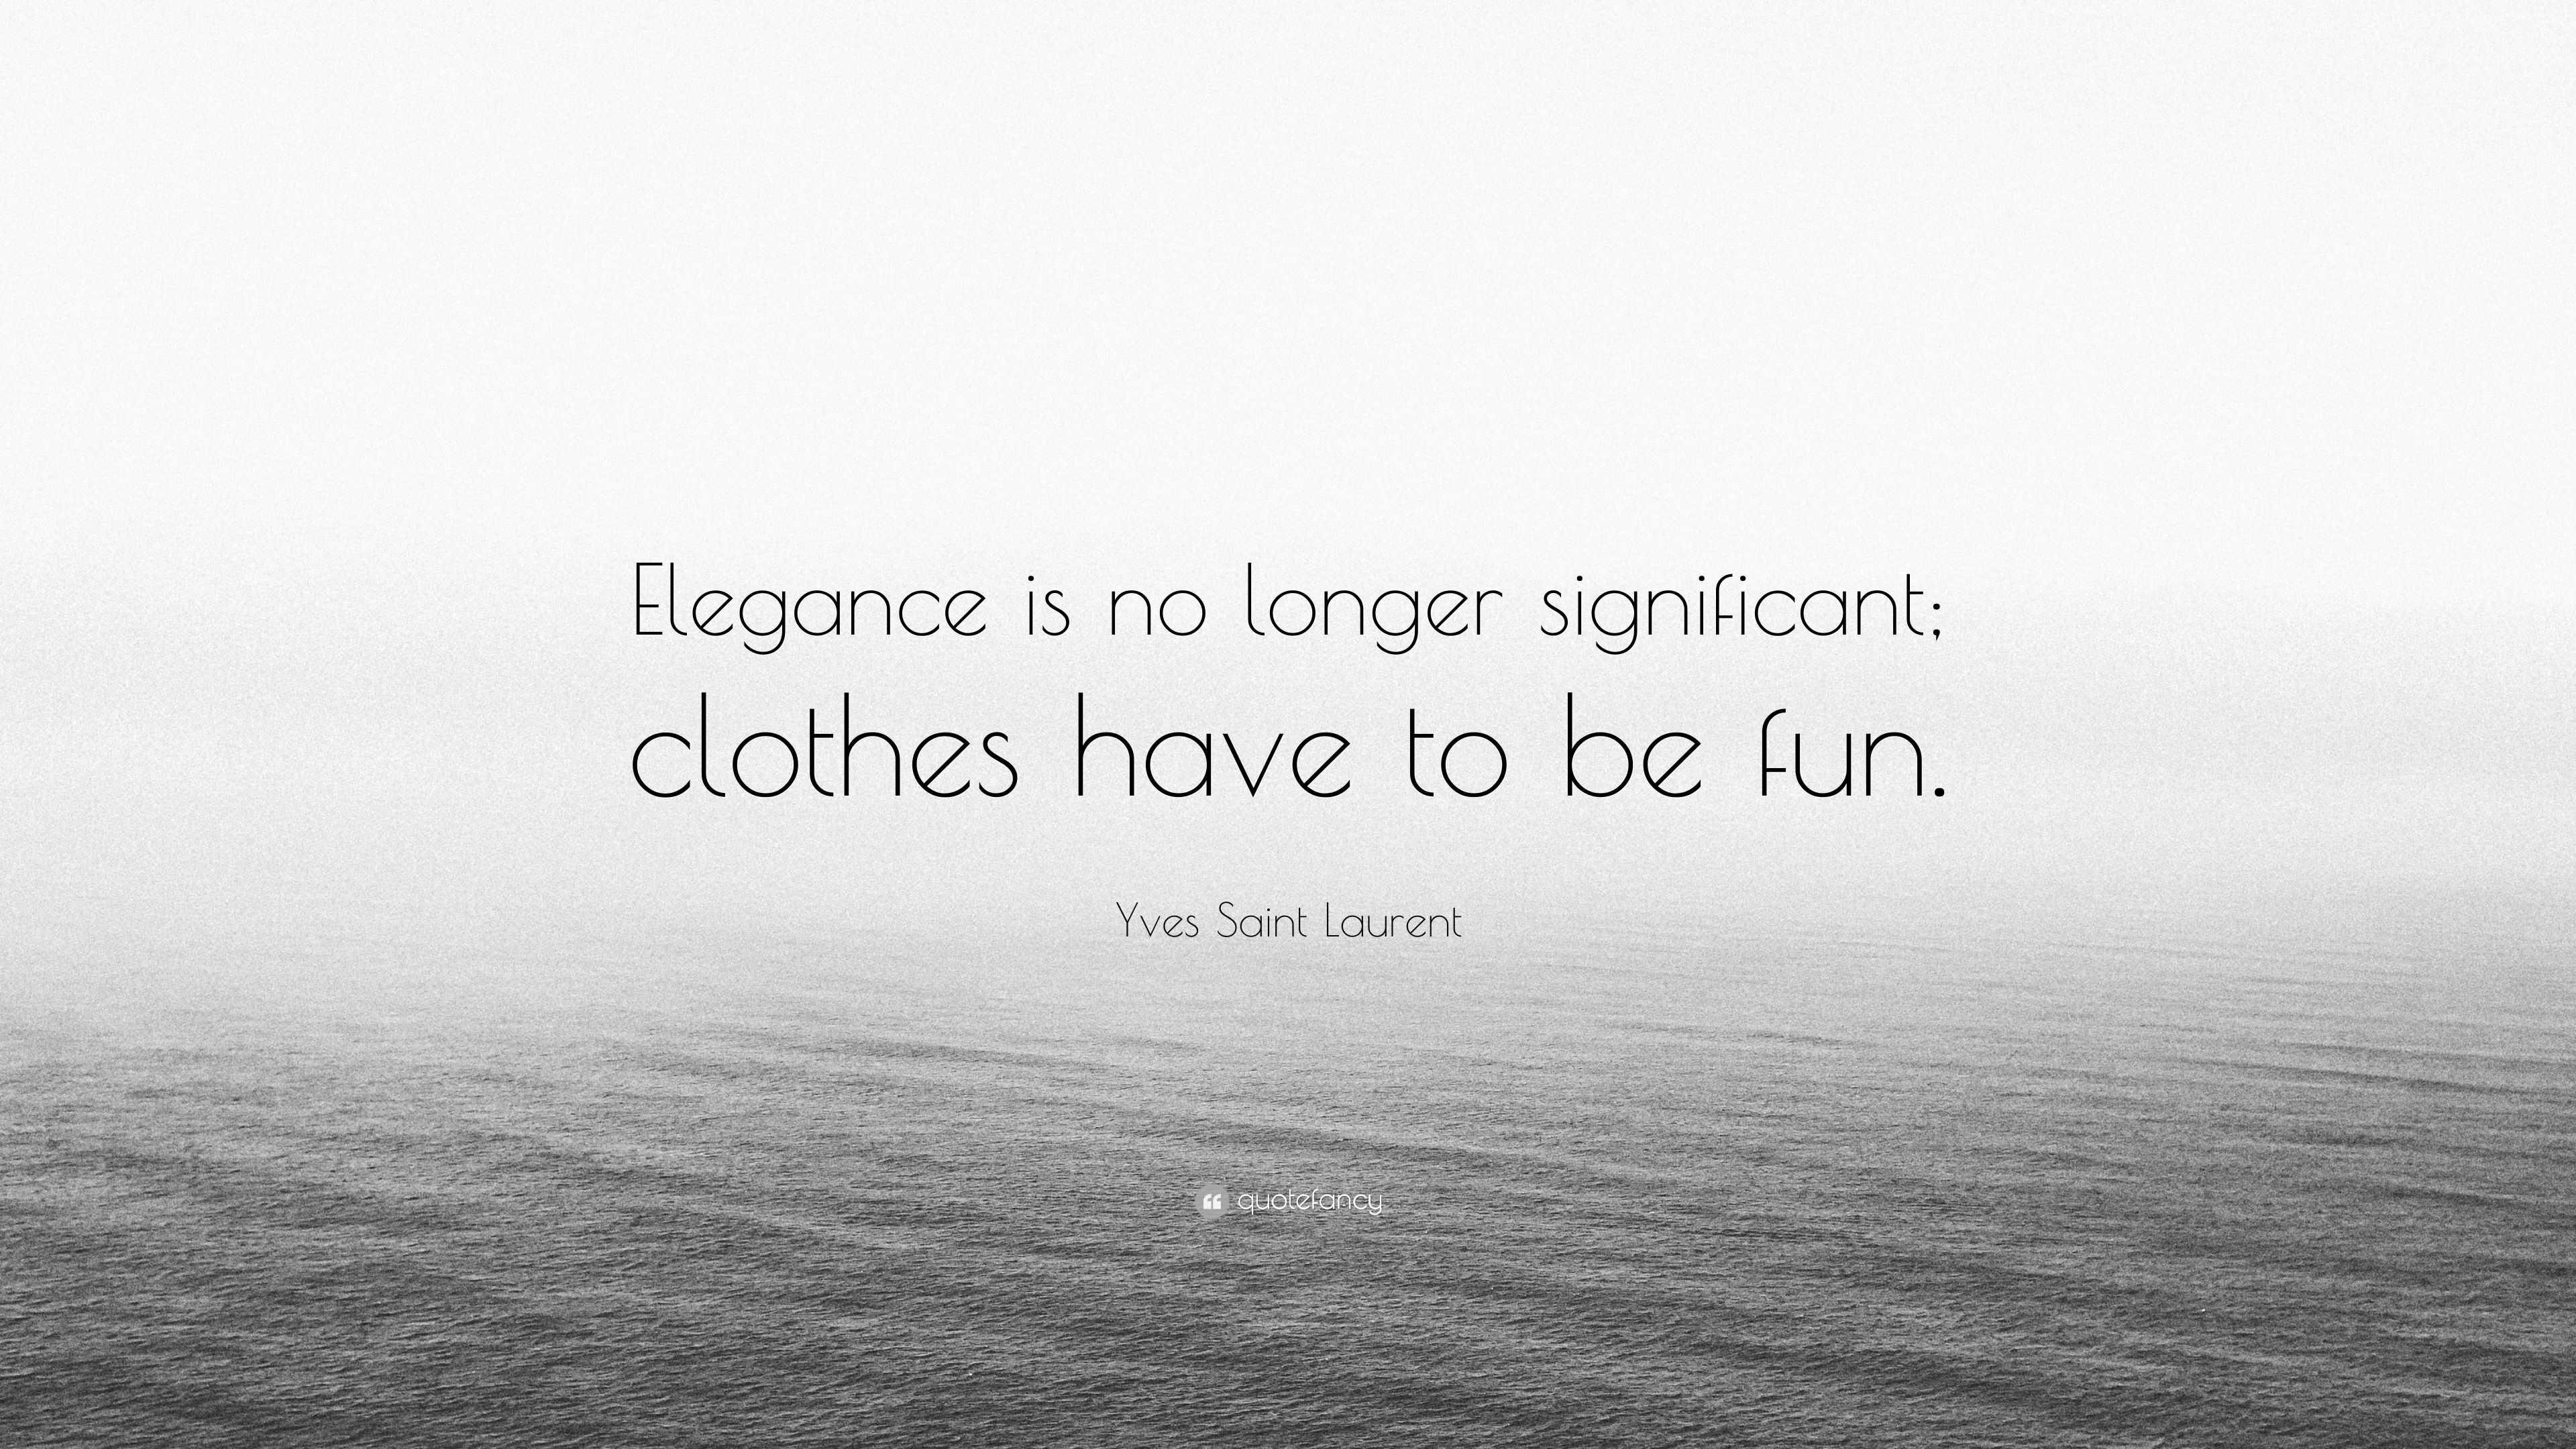 Yves Saint Laurent Quote Elegance Is No Longer Significant